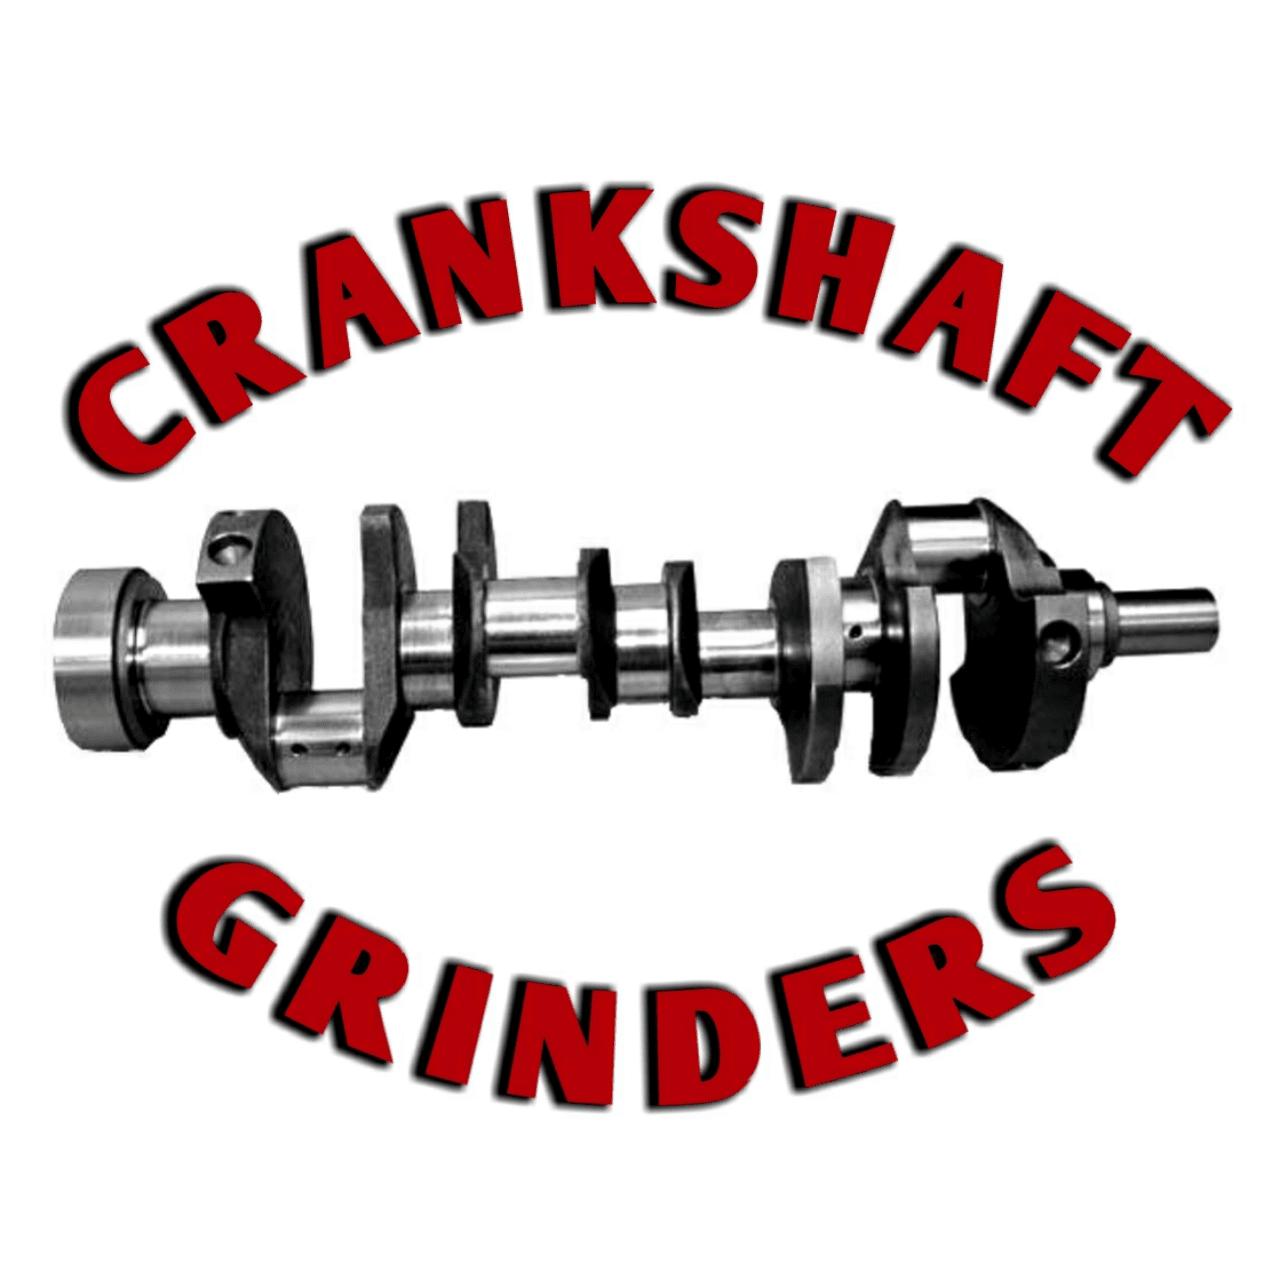 Crankshaft Grinders